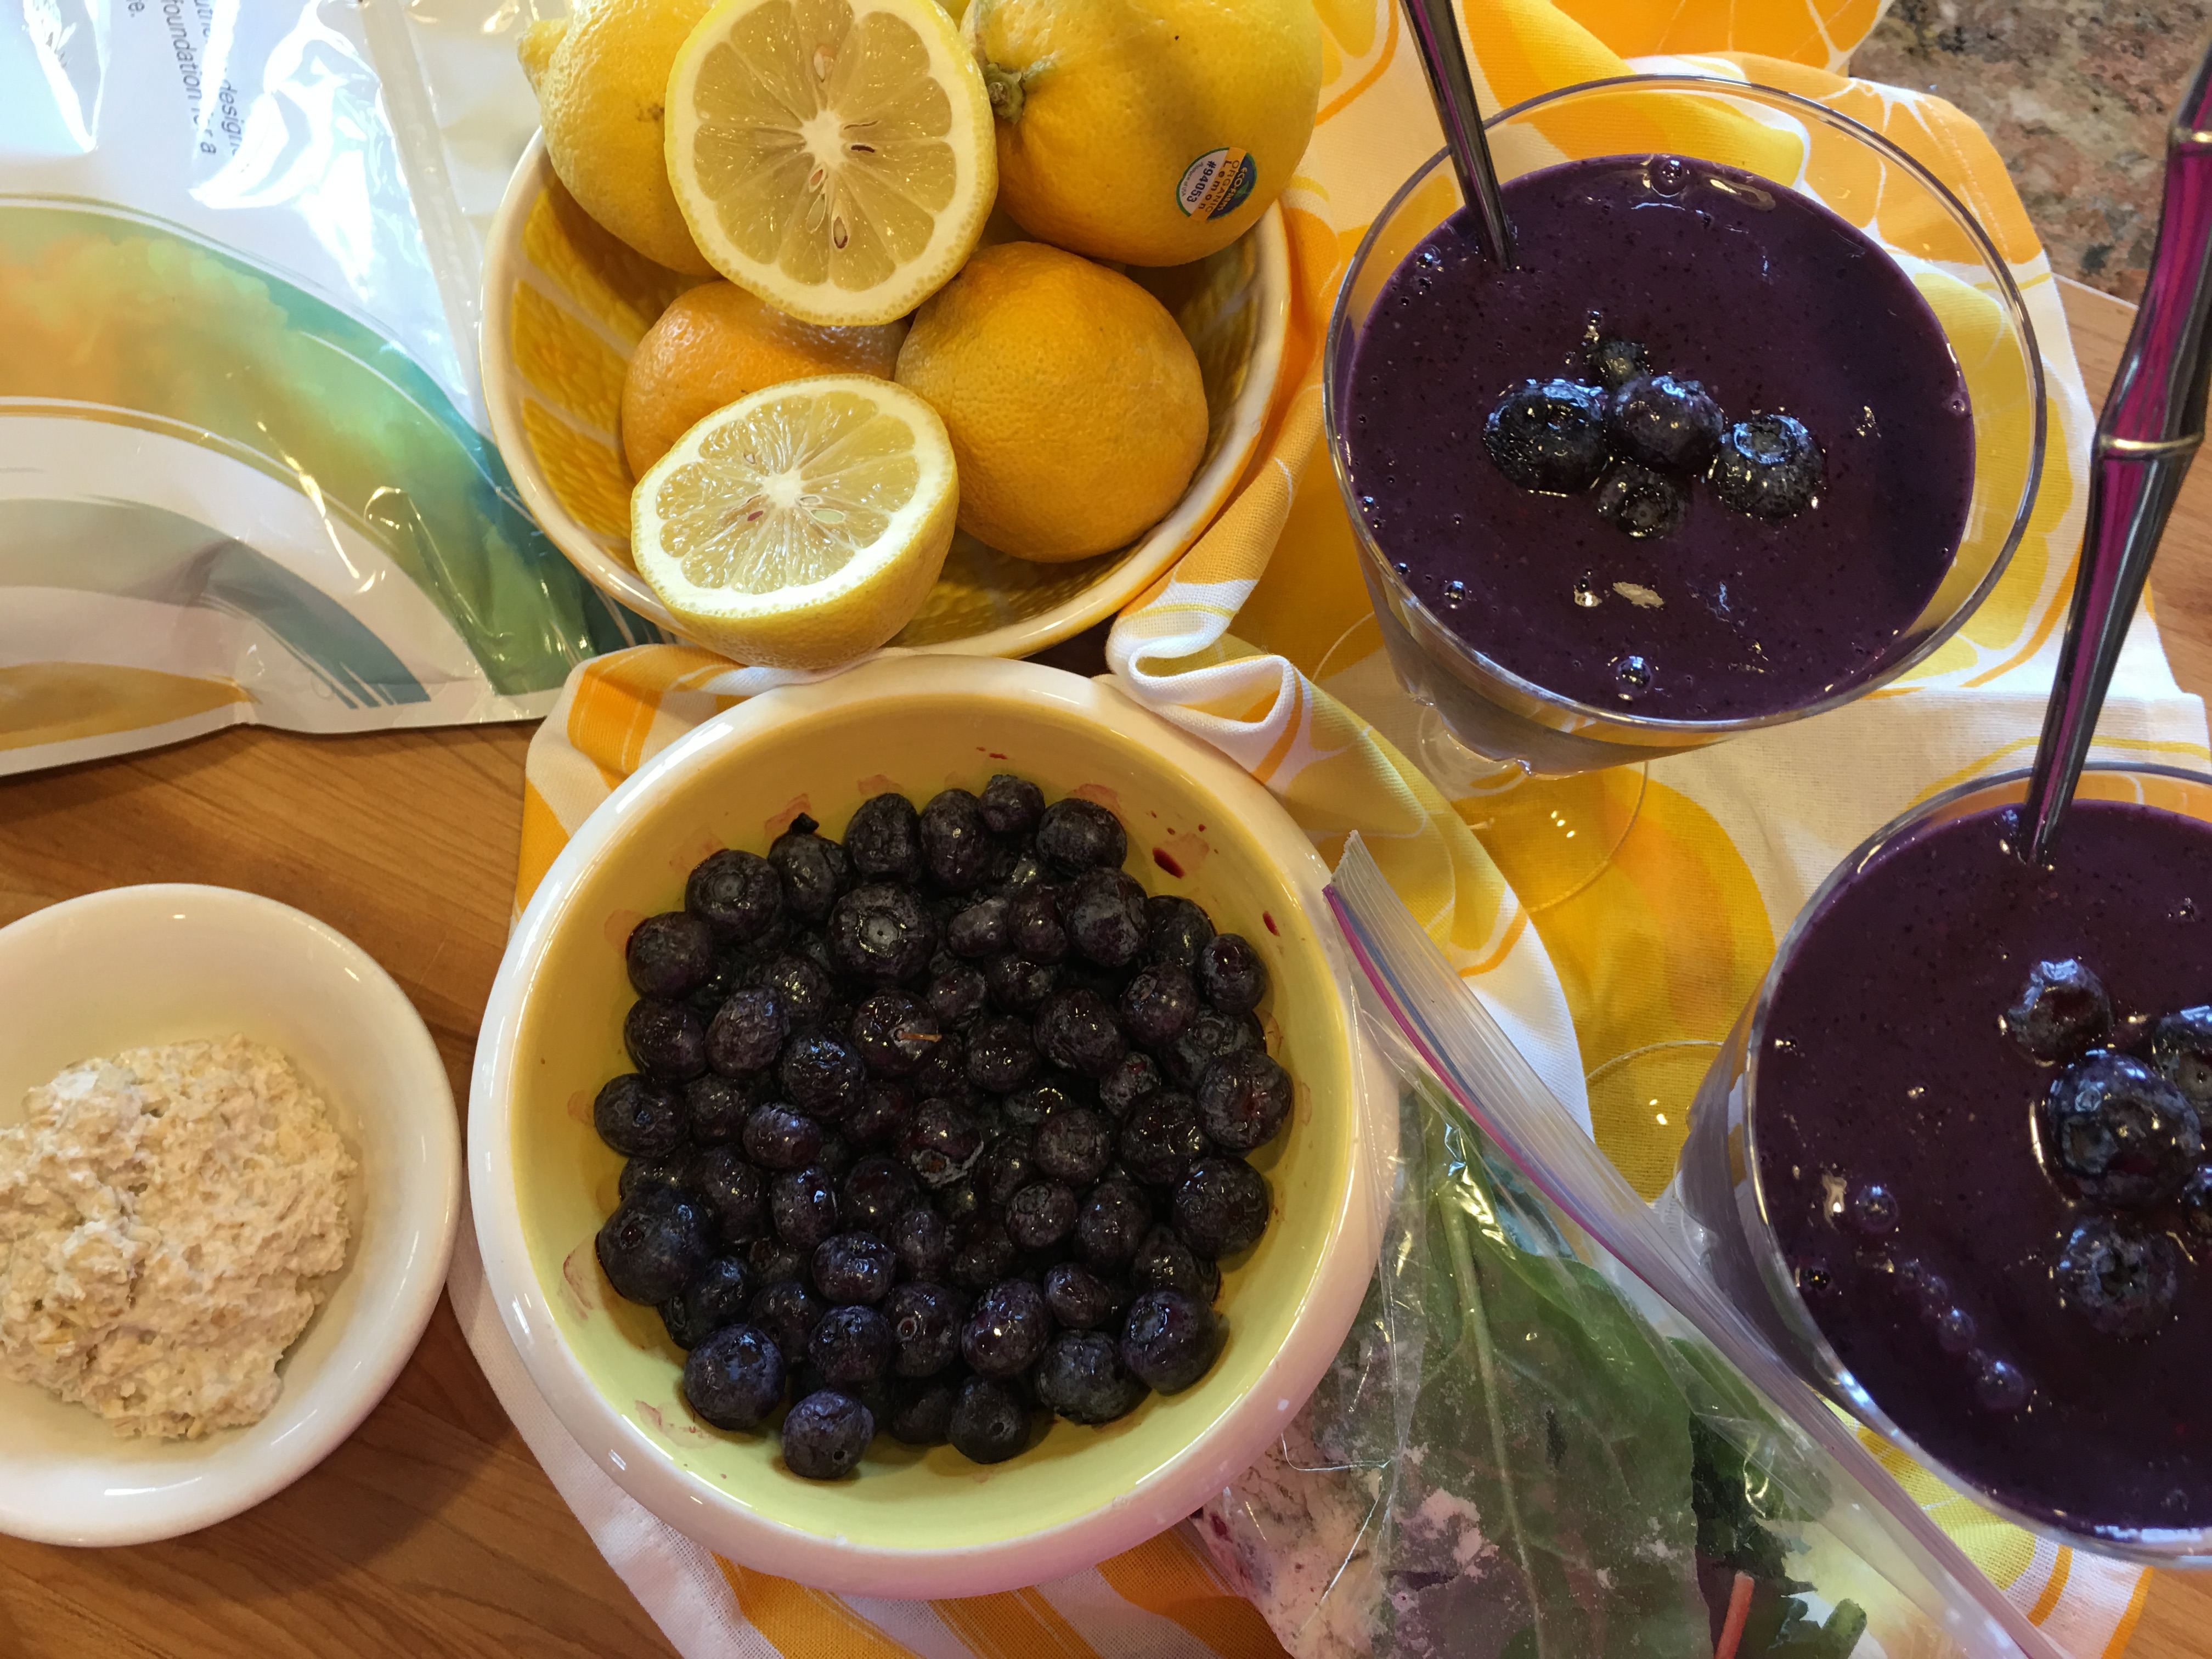 Blueberry-Lemon Oatmeal Smoothie | Avocado Runners